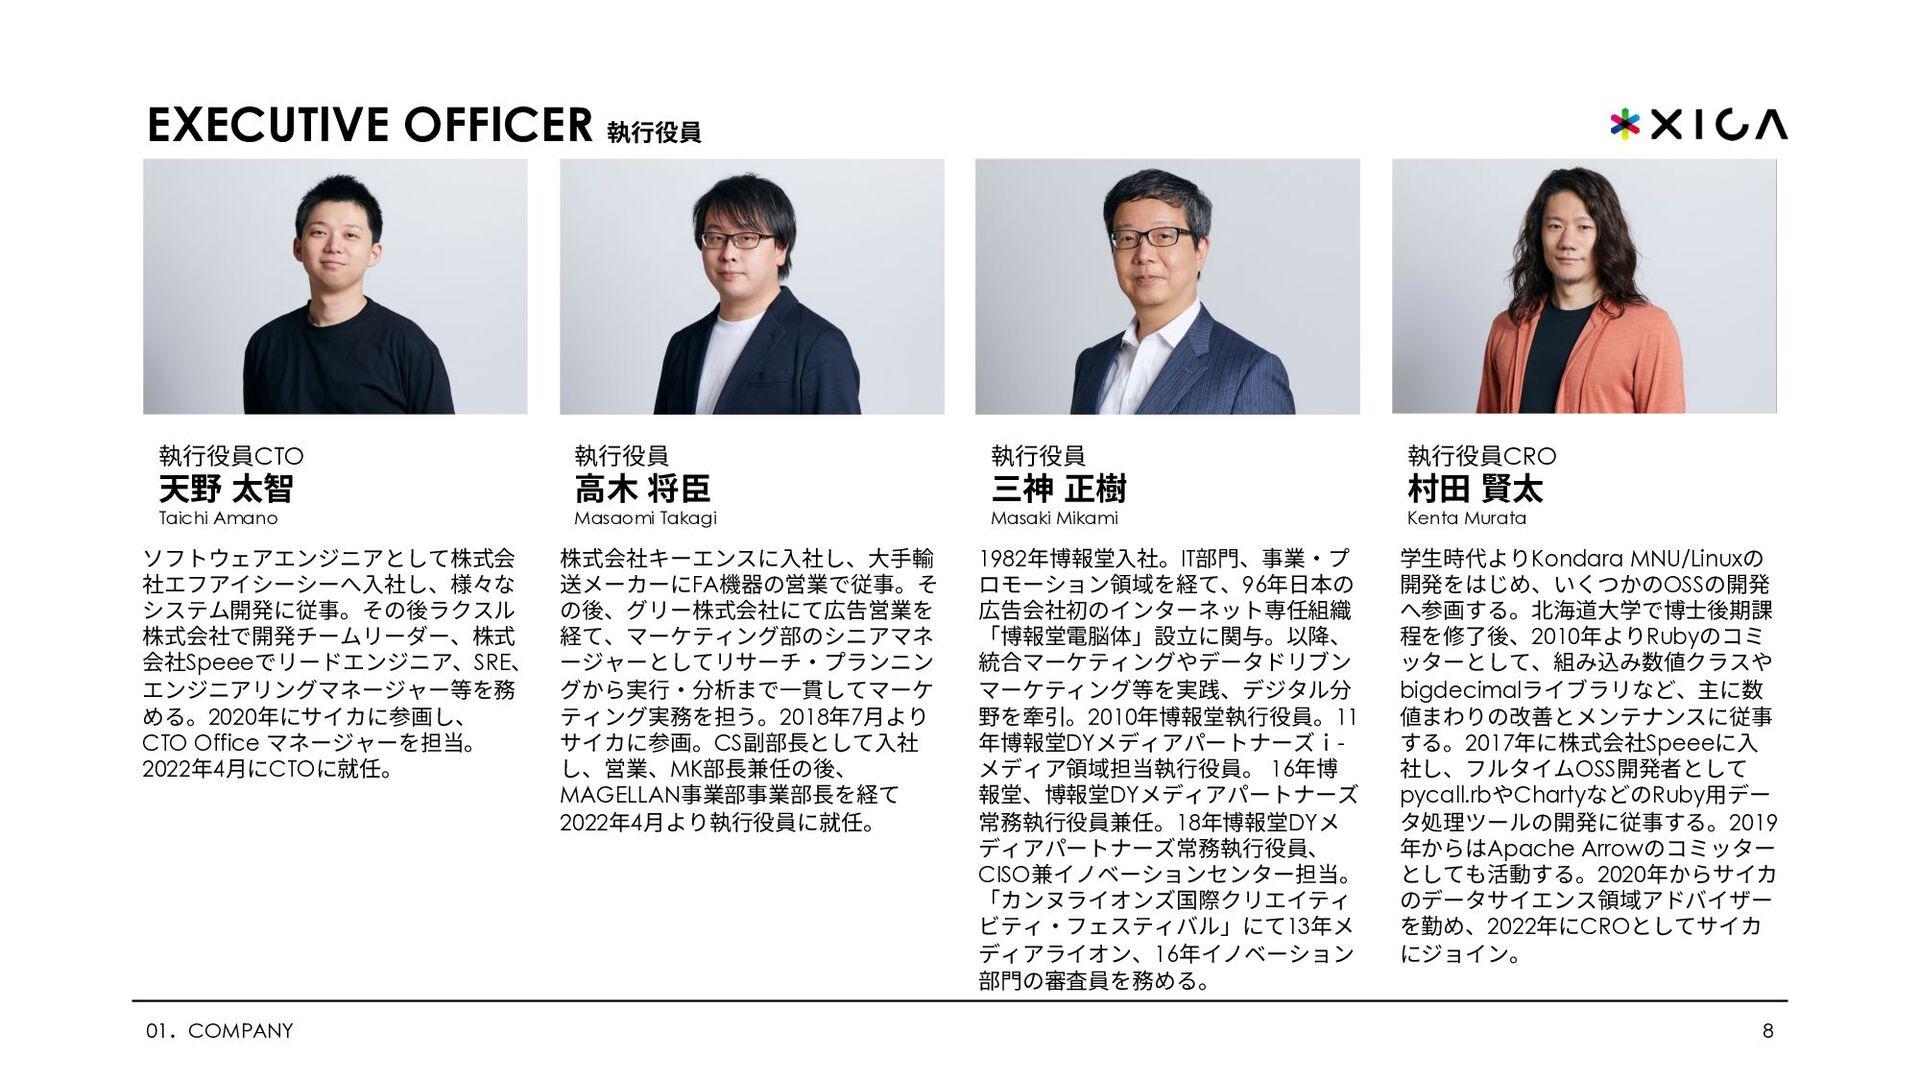 PHILOSOPHY ビジョン/ミッション 02.PHILOSOPHY 8